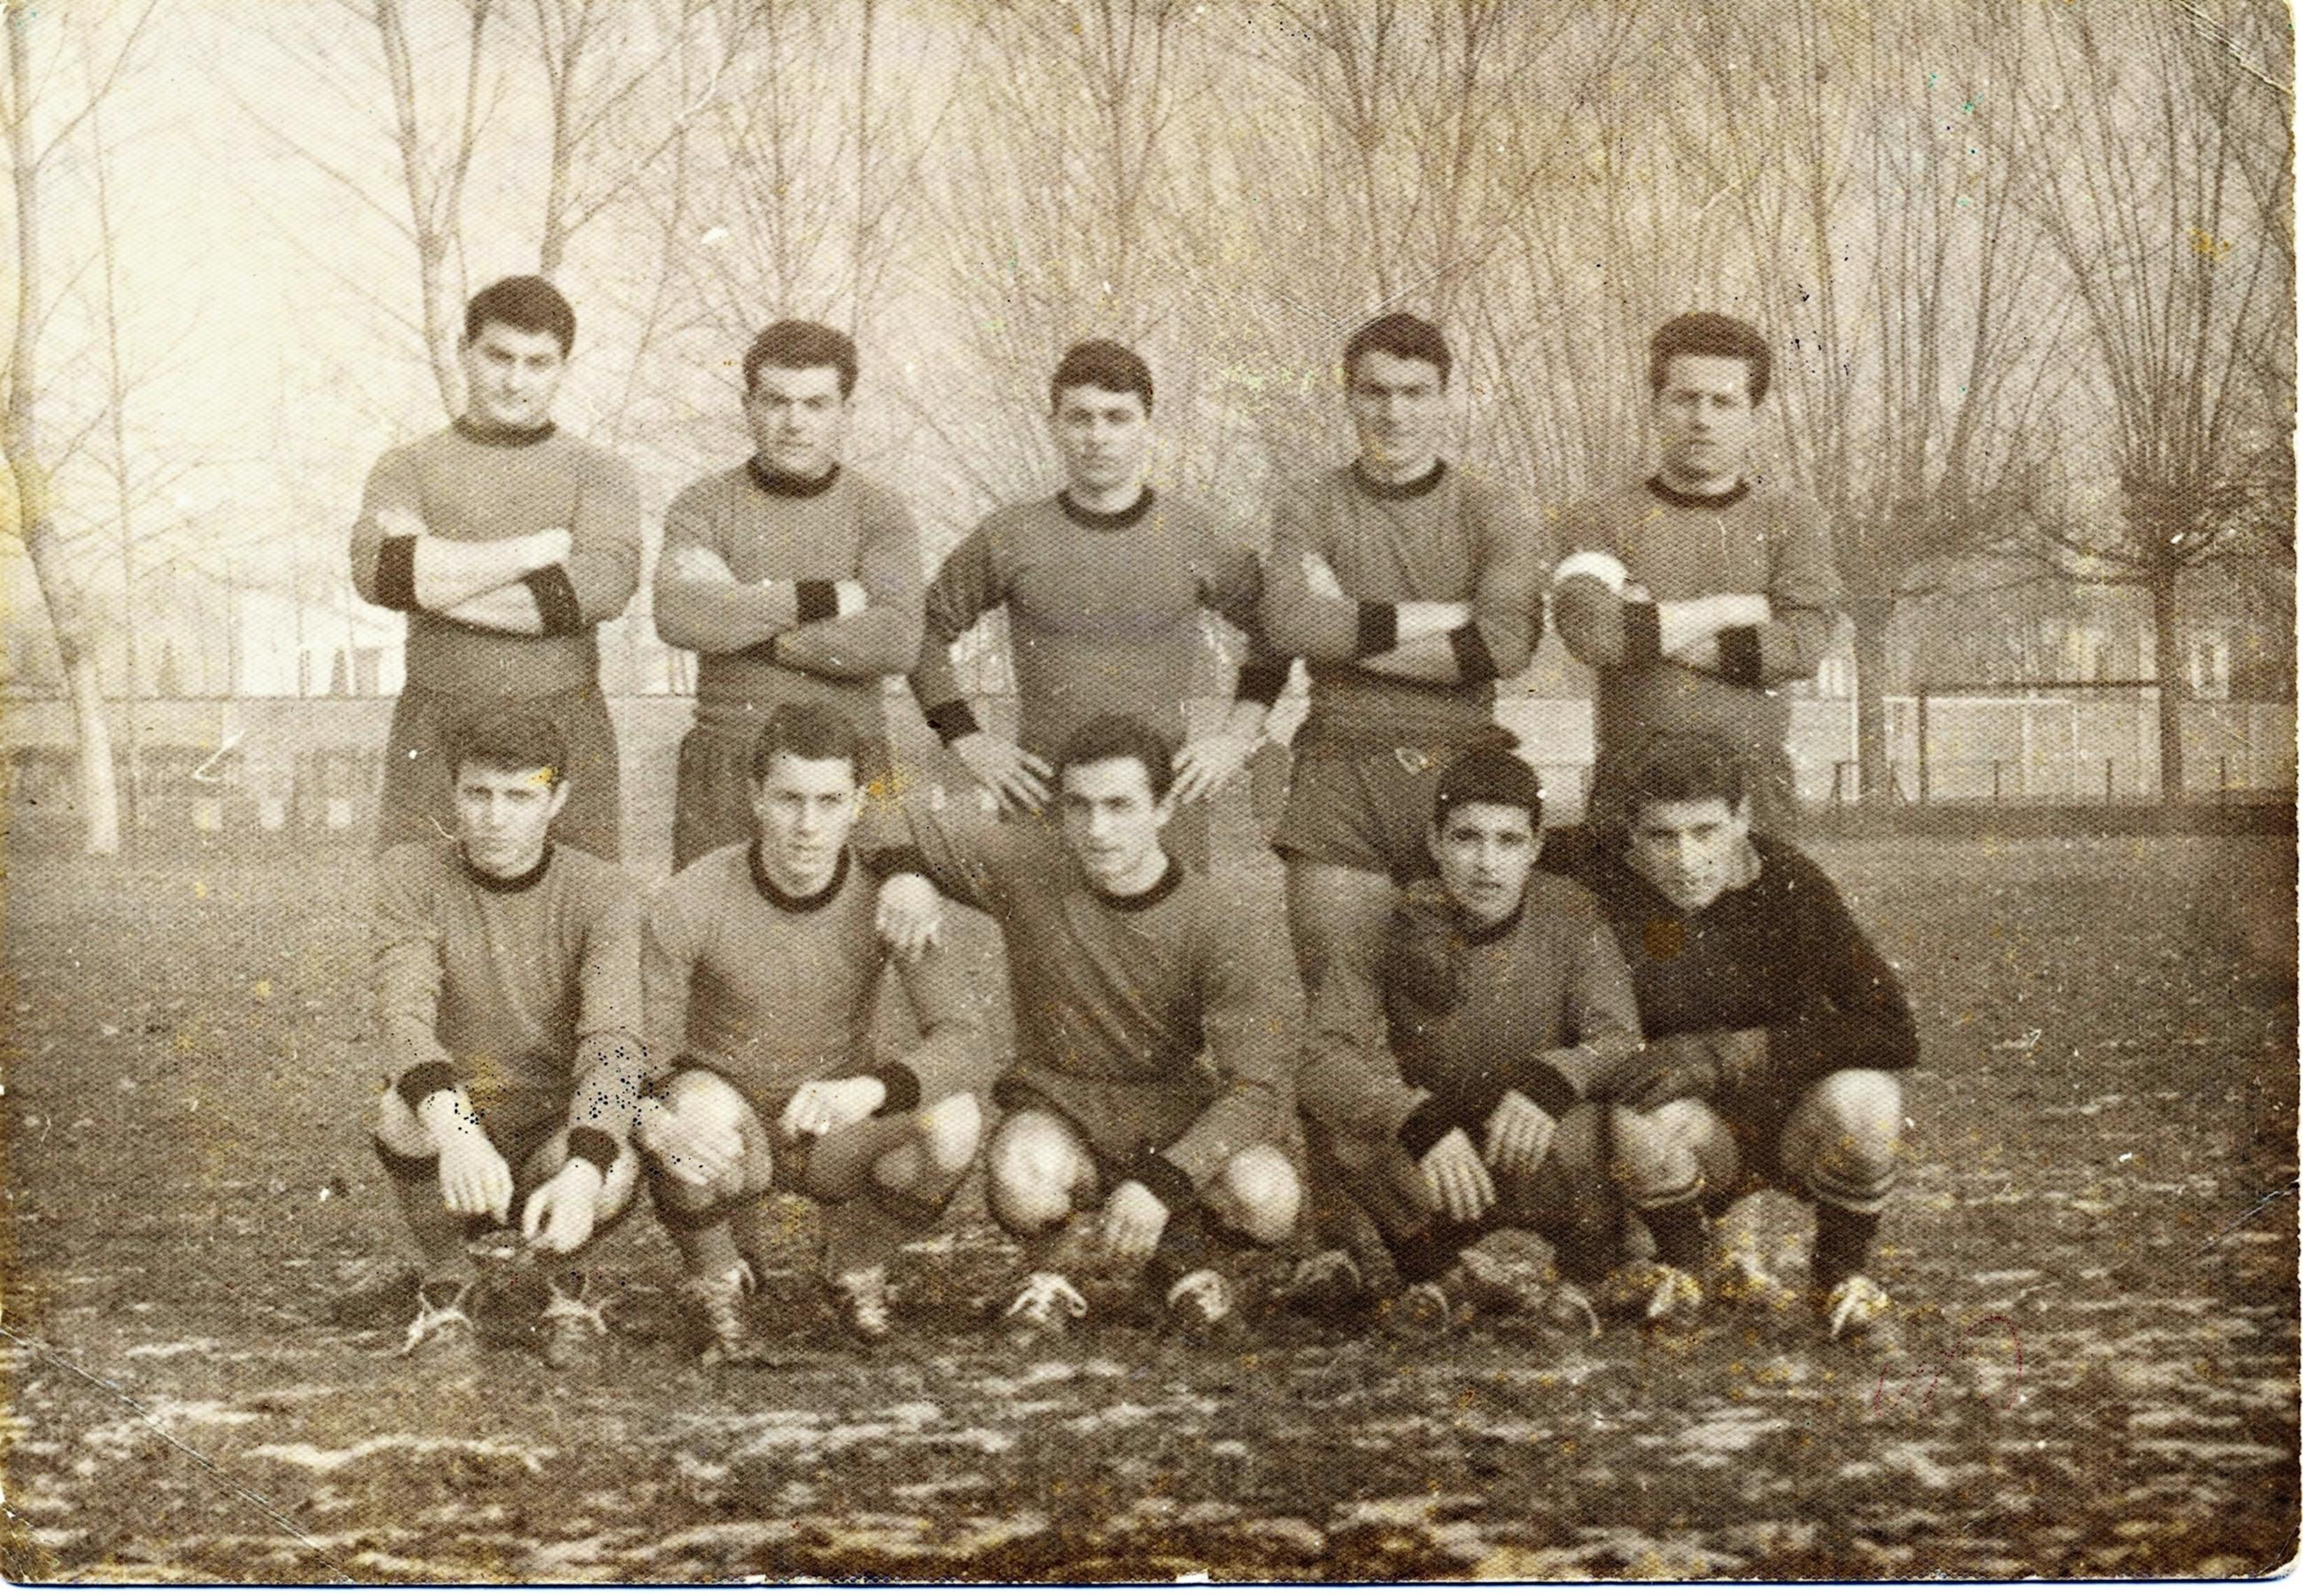 1963/64, U.S. Condor Battaglia Terme.